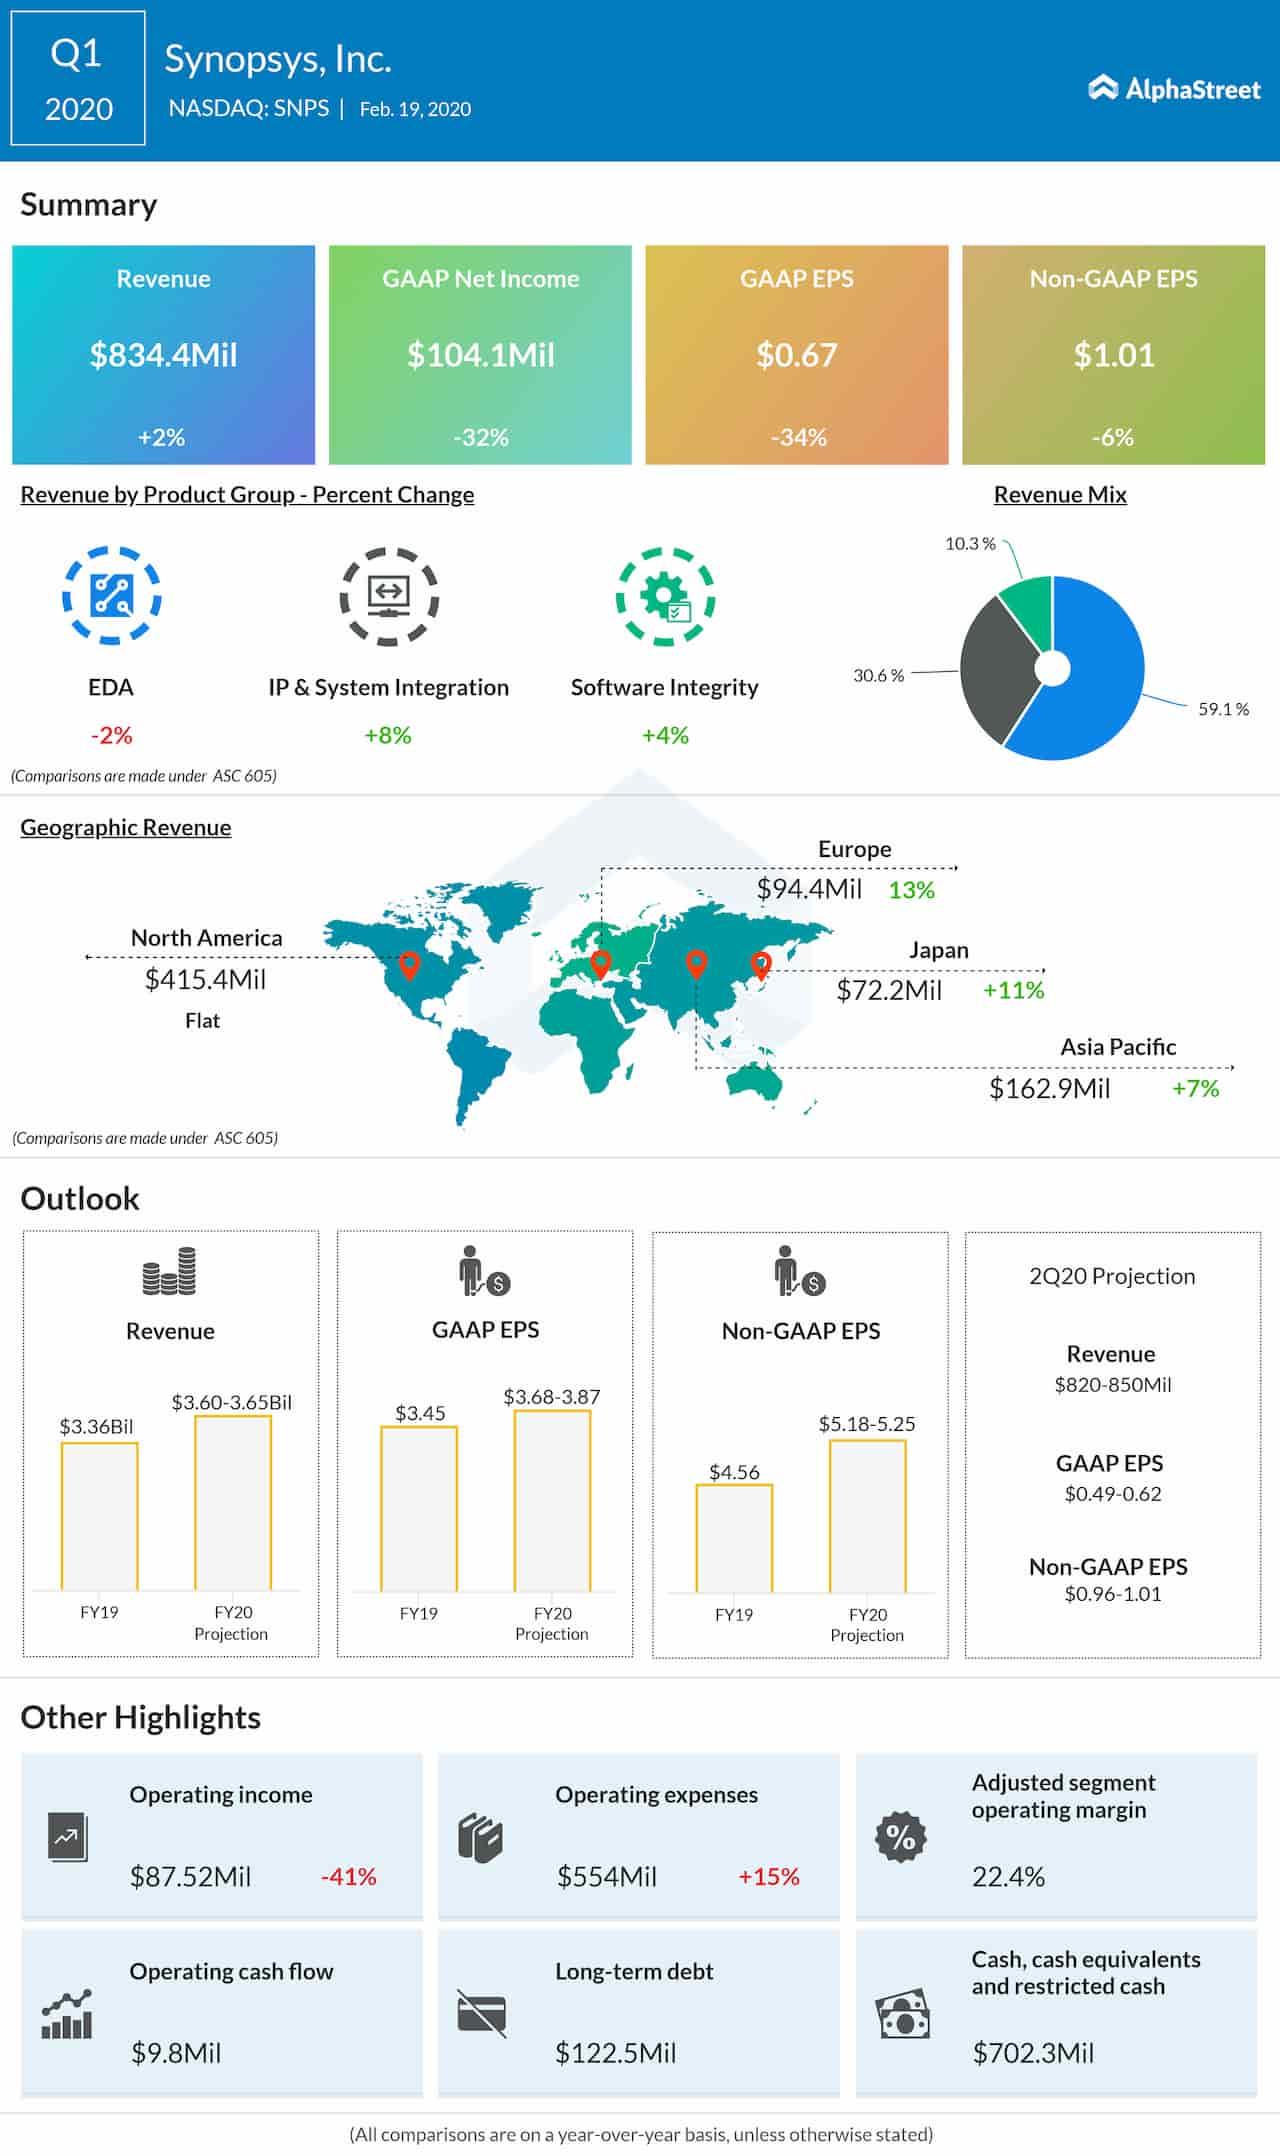 Synopsys, Inc. (NASDAQ: SNPS): Q1 2020 Earnings Snapshot